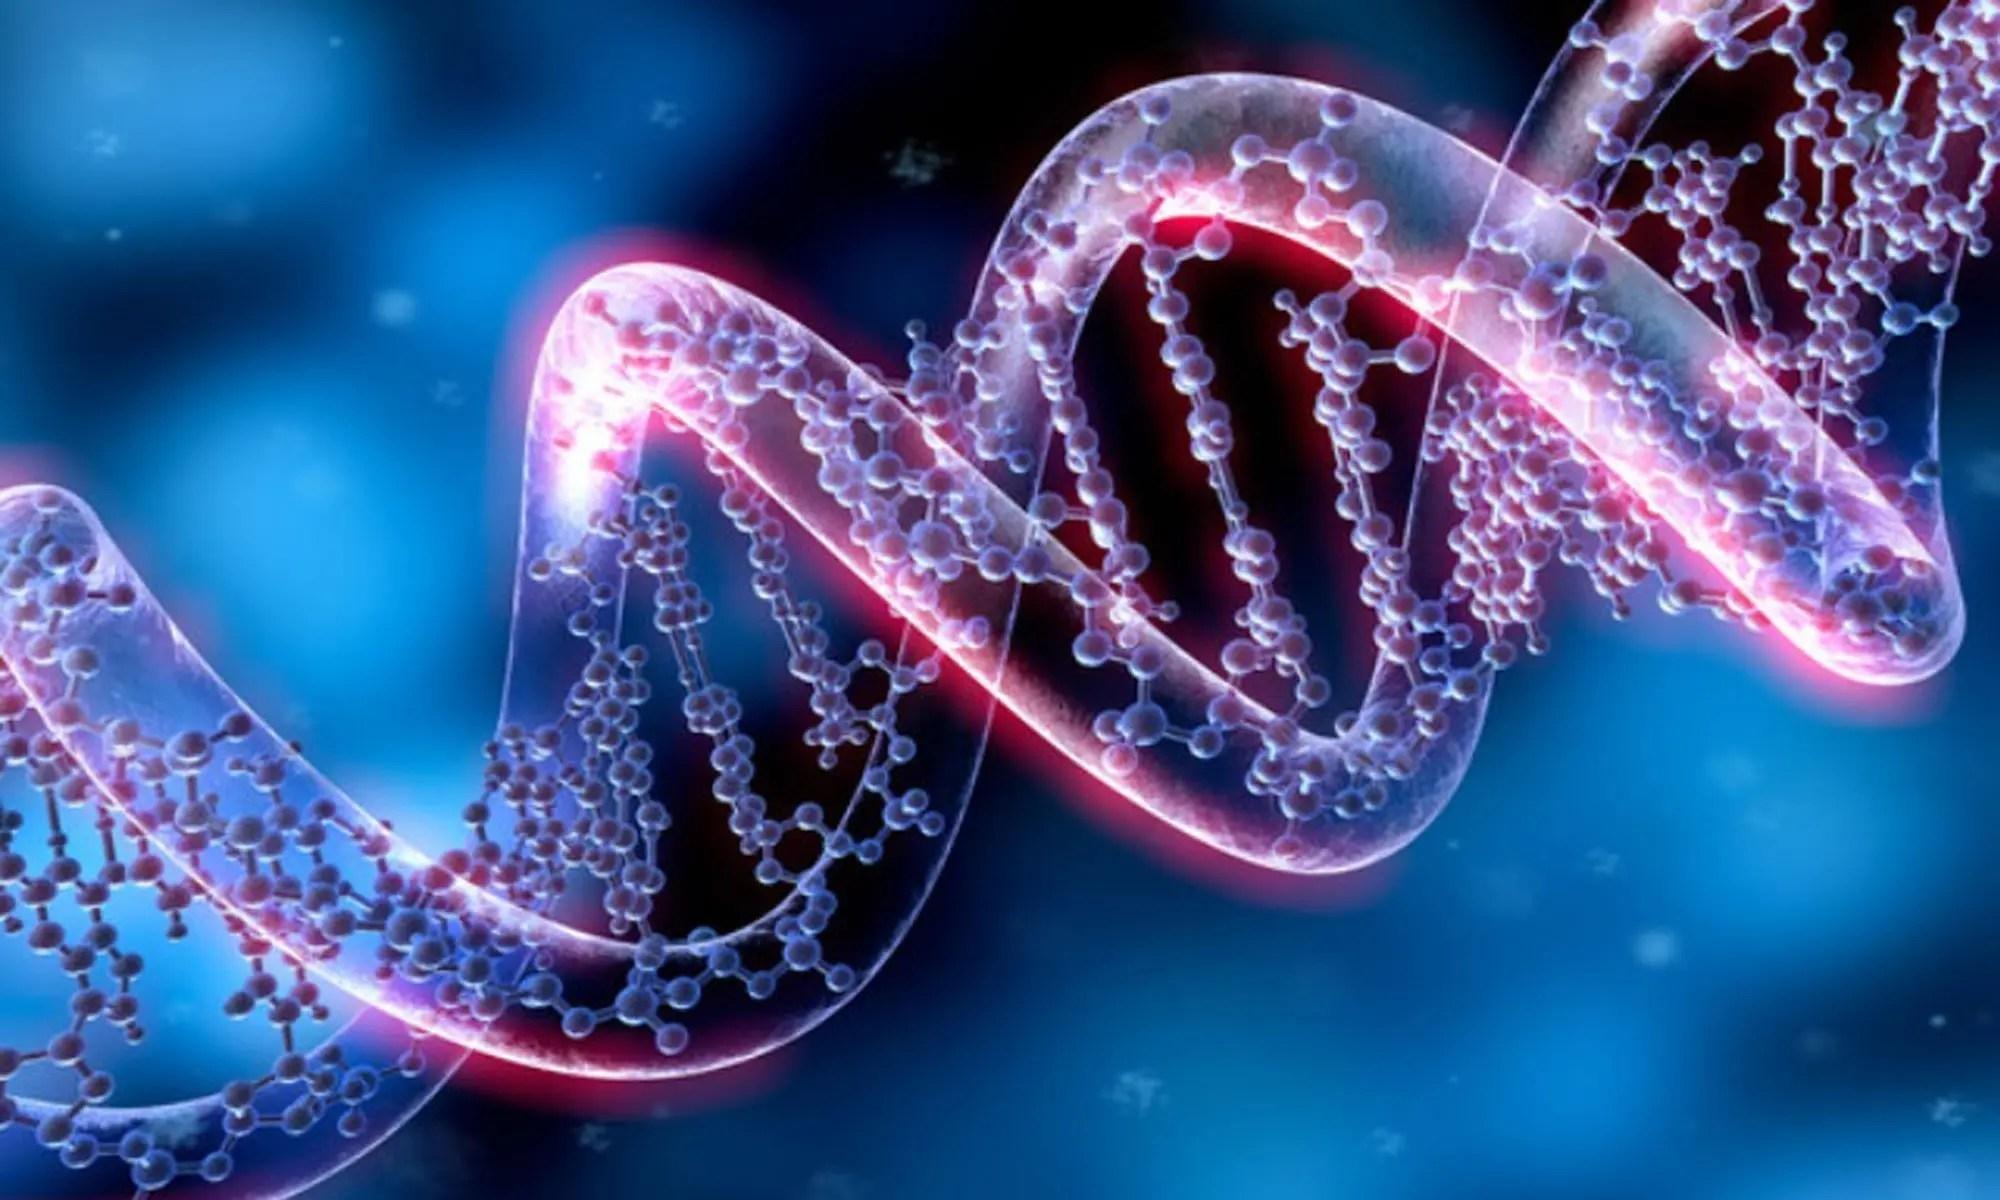 image of Genome damage